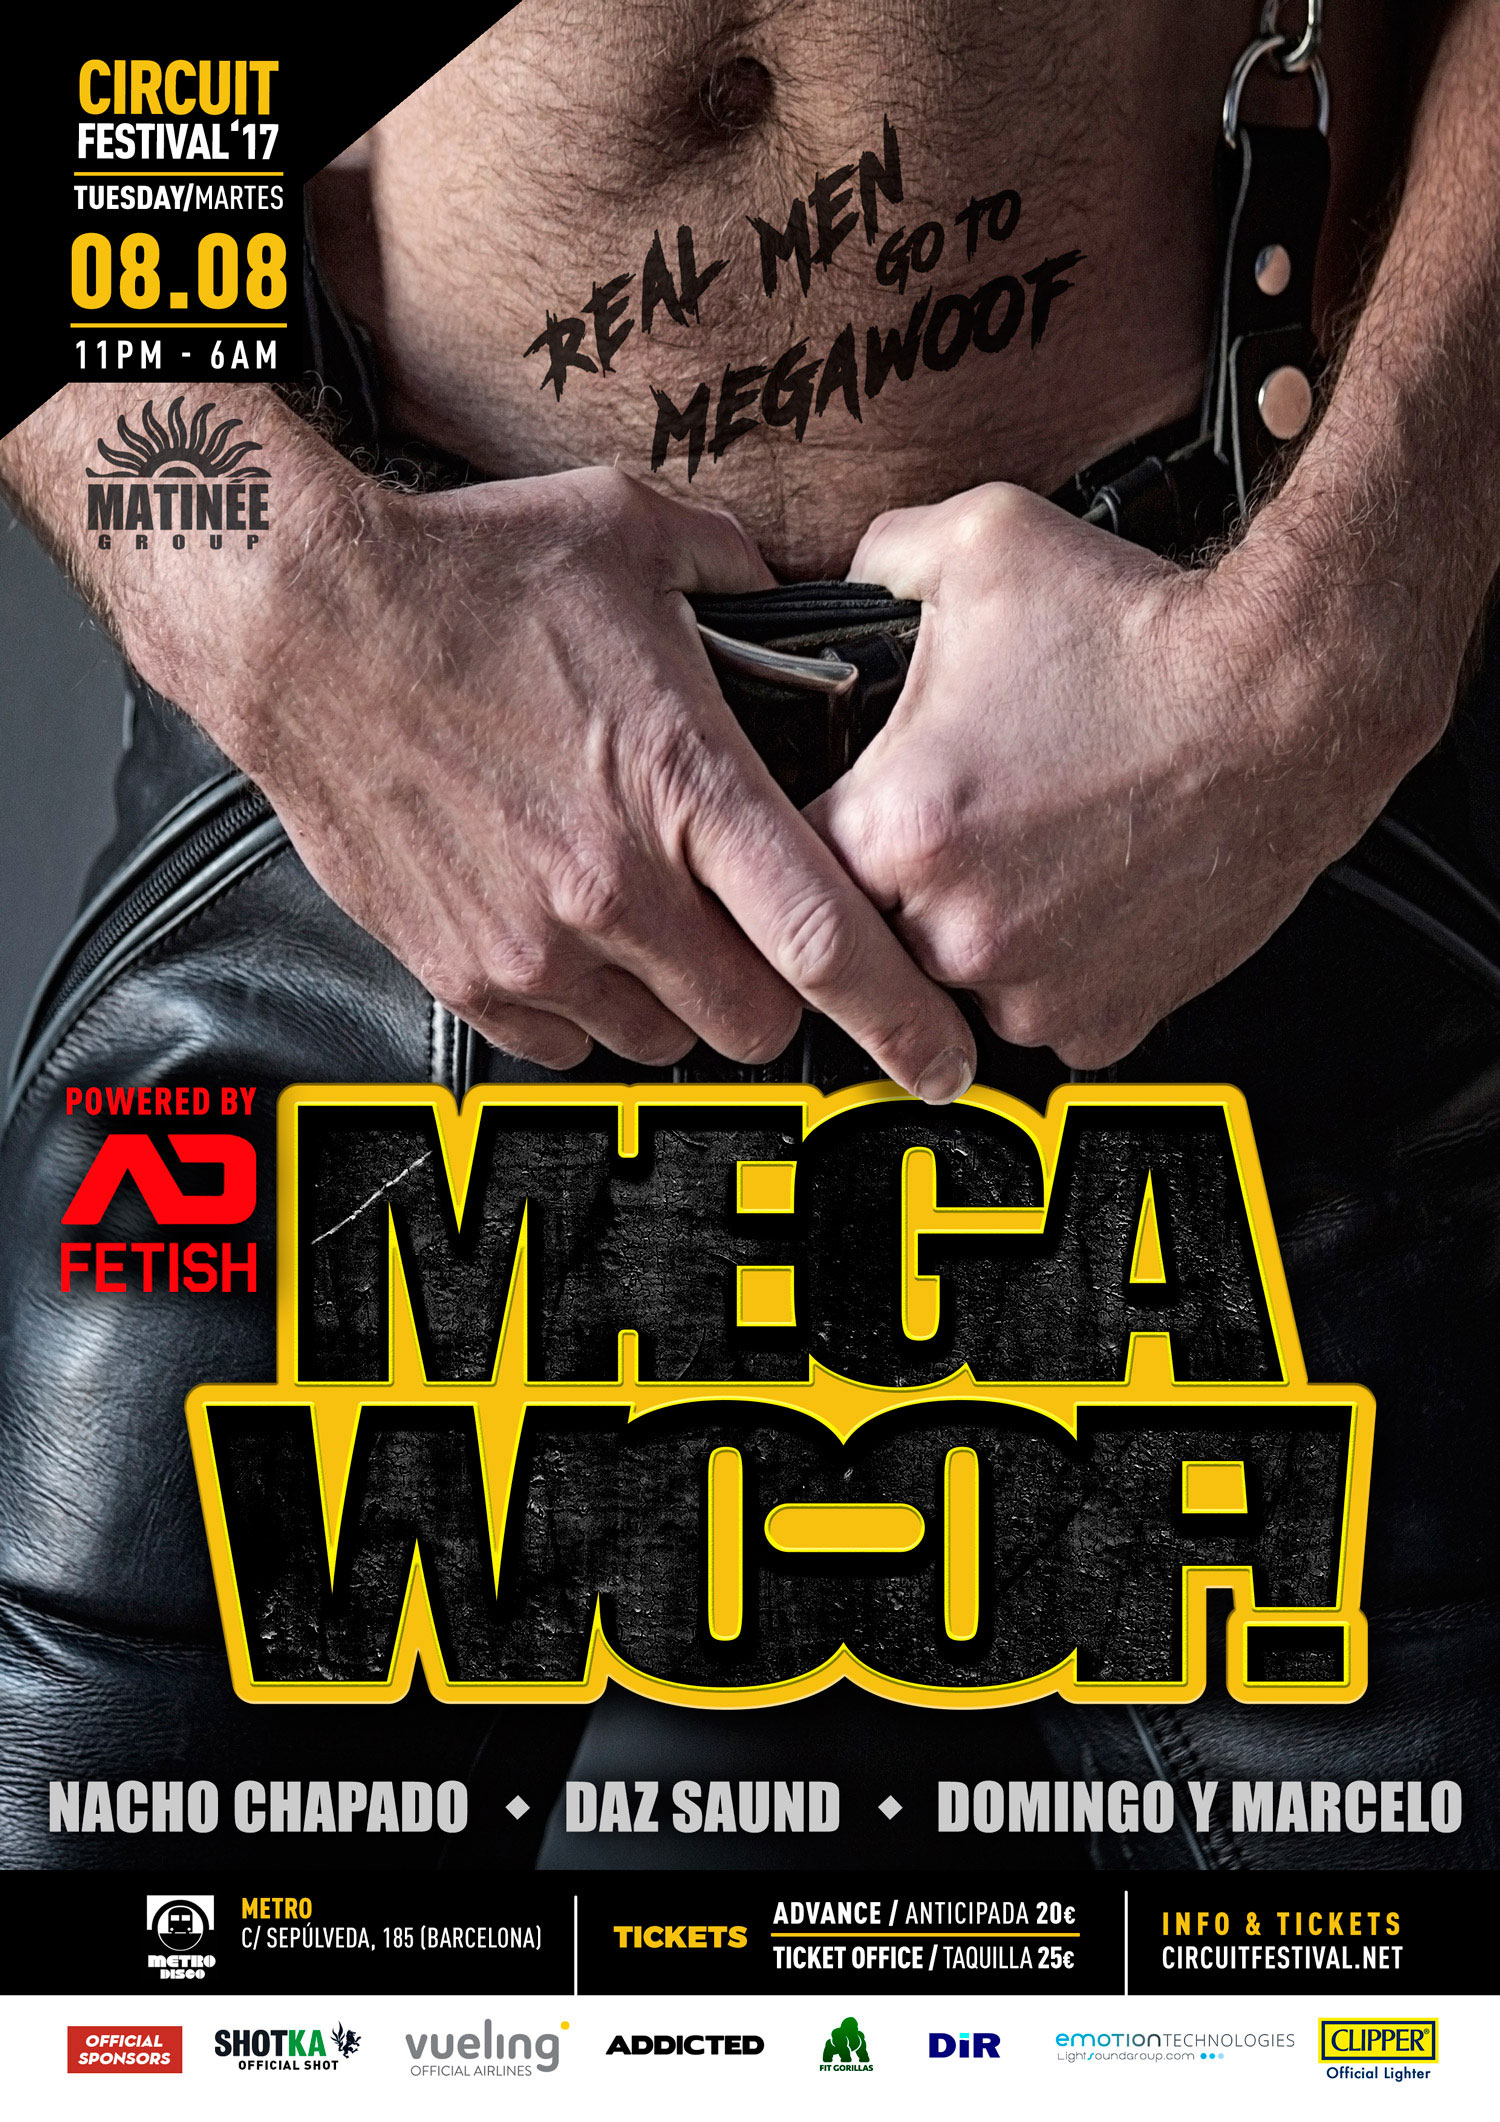 3-C17_Megawoof_flyer